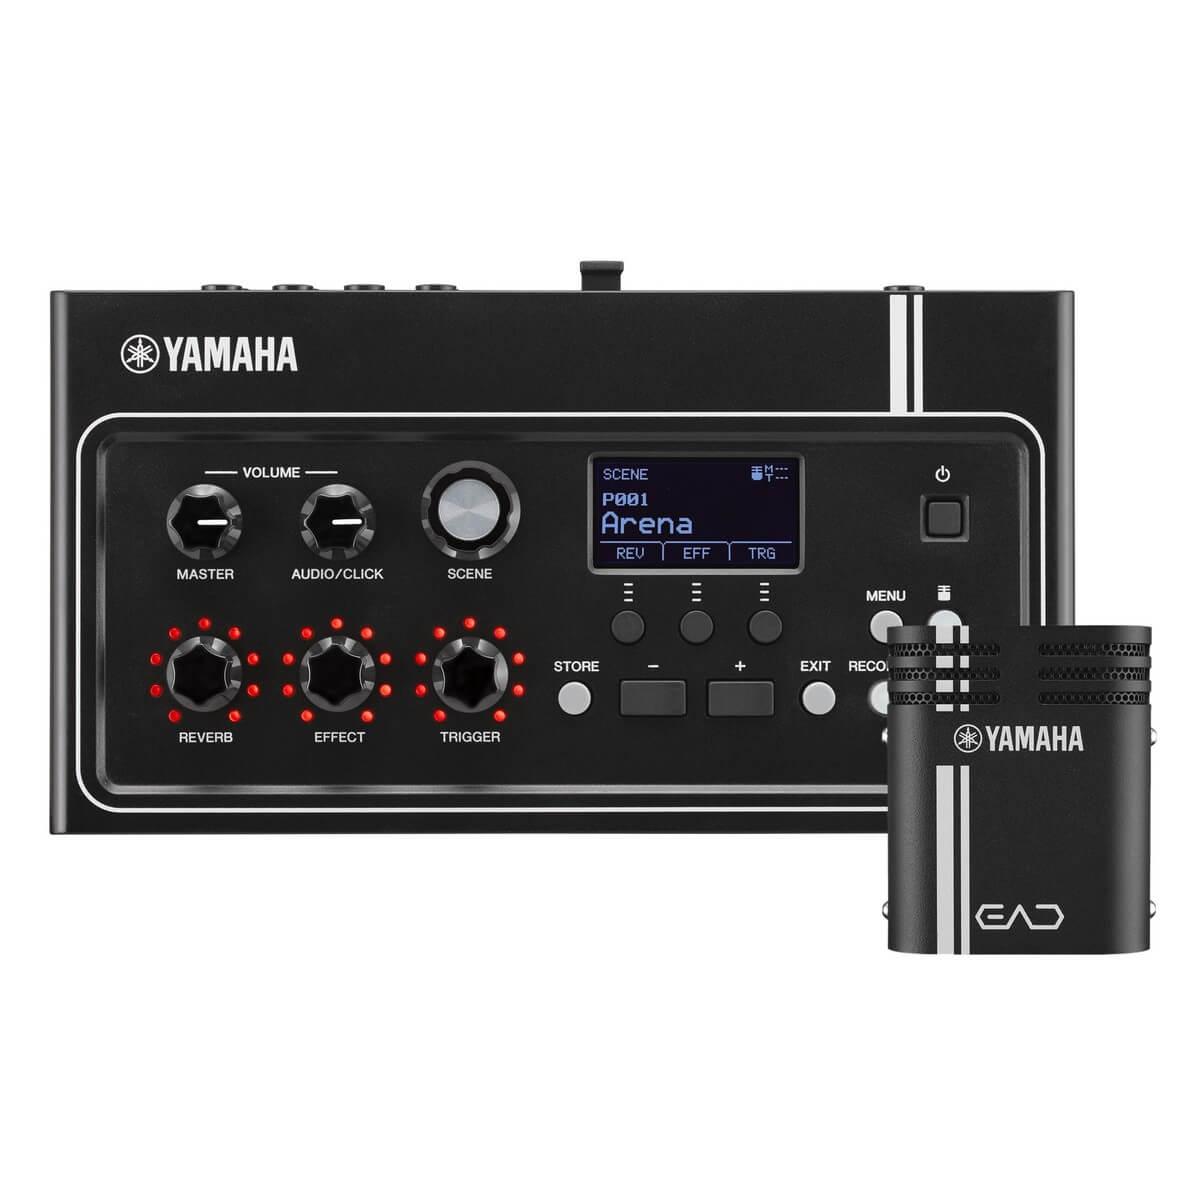 Modulo Para Bateria Yamaha Ead10